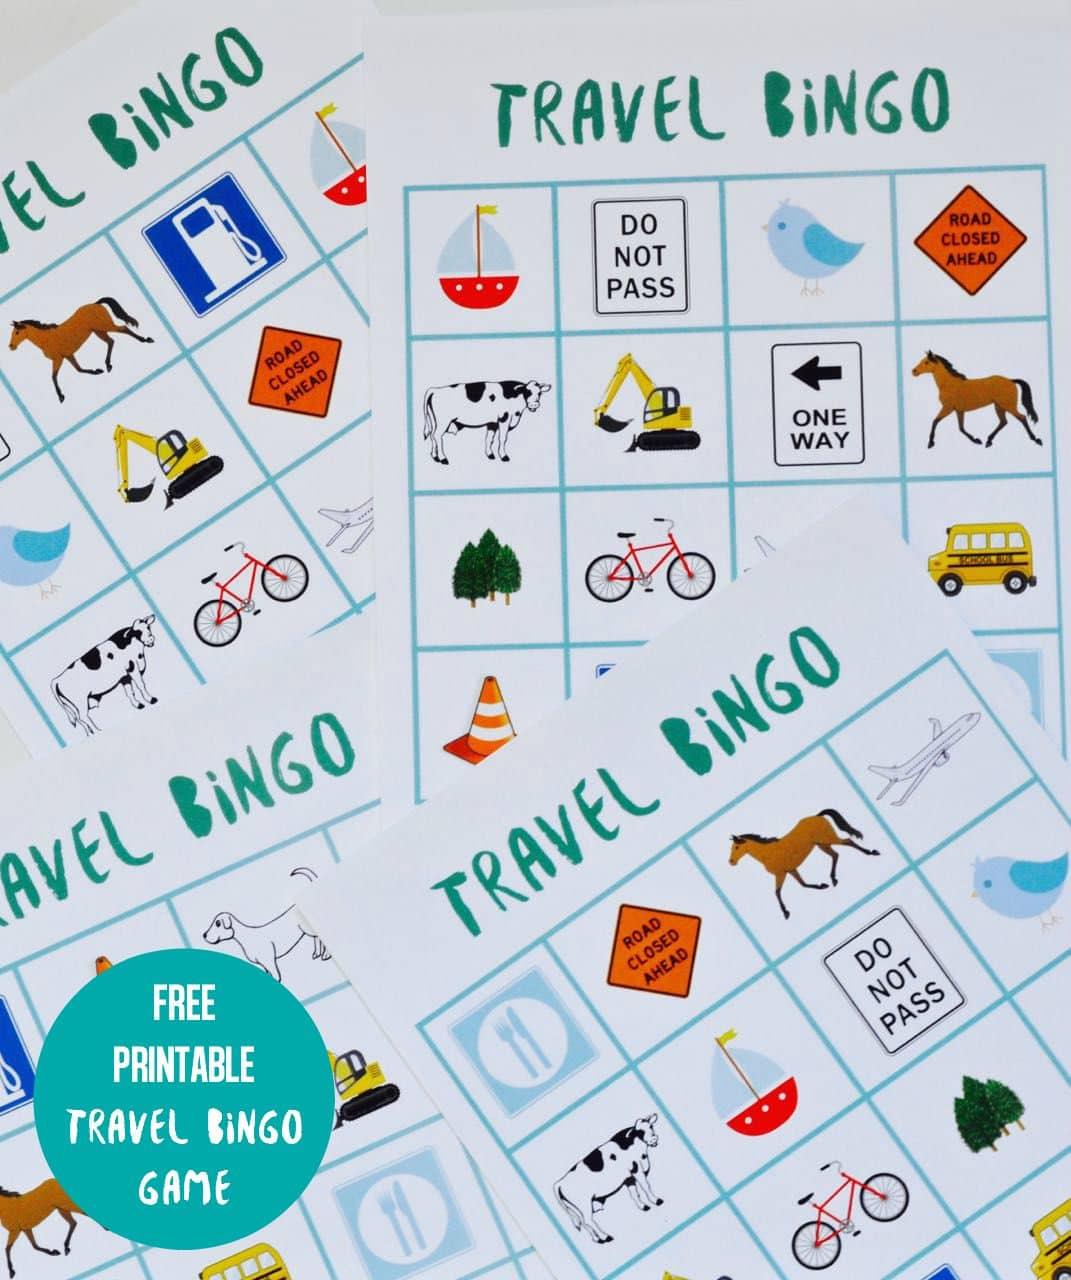 Free Printable Travel Bingo Game by MLL